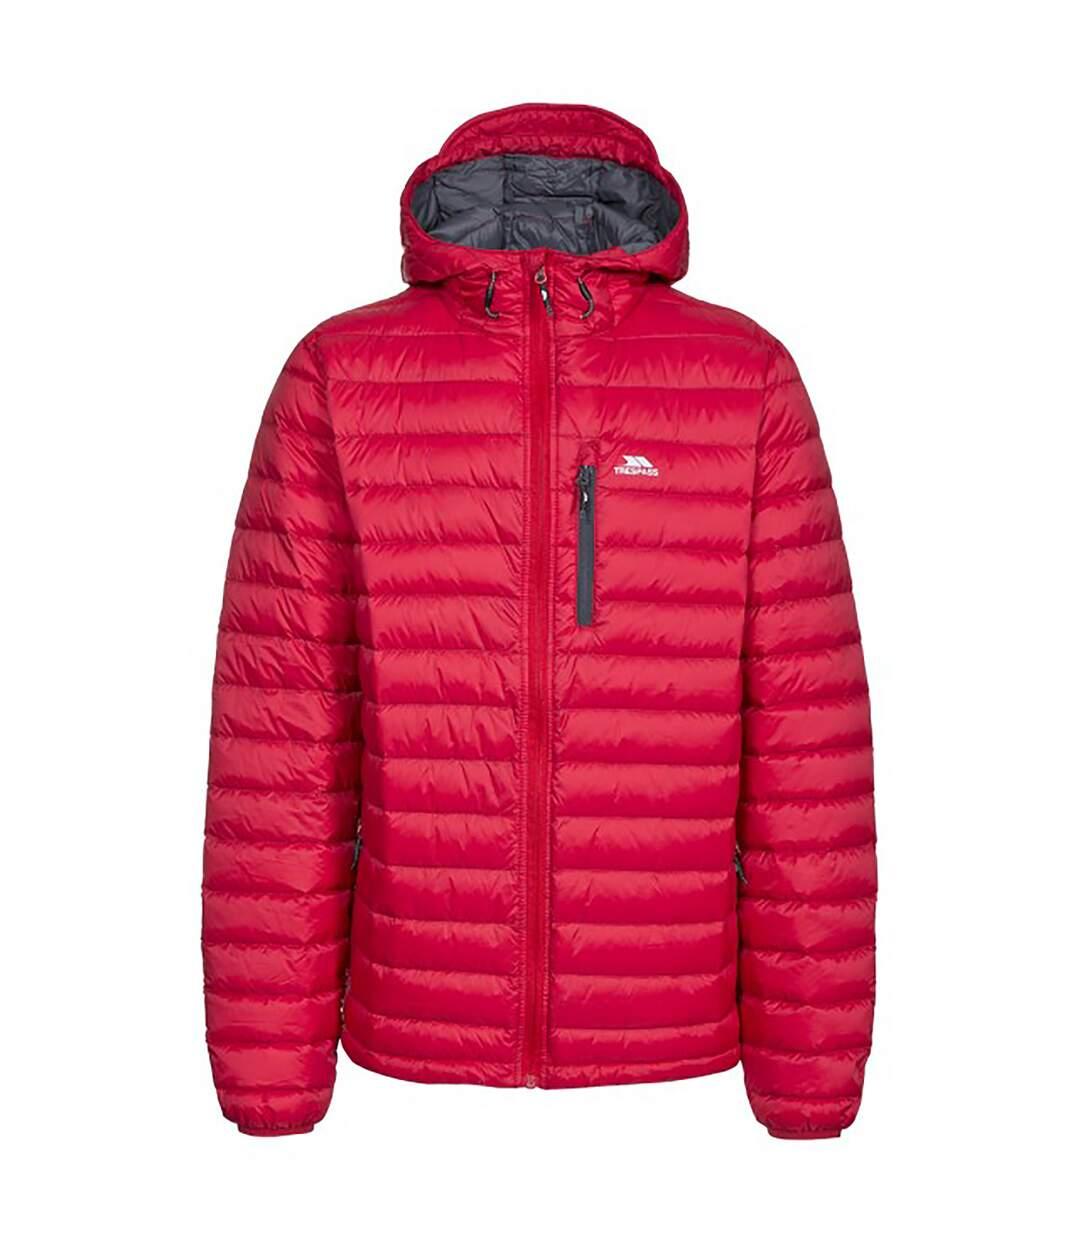 Trespass Mens Digby Down Jacket (Red) - UTTP3283